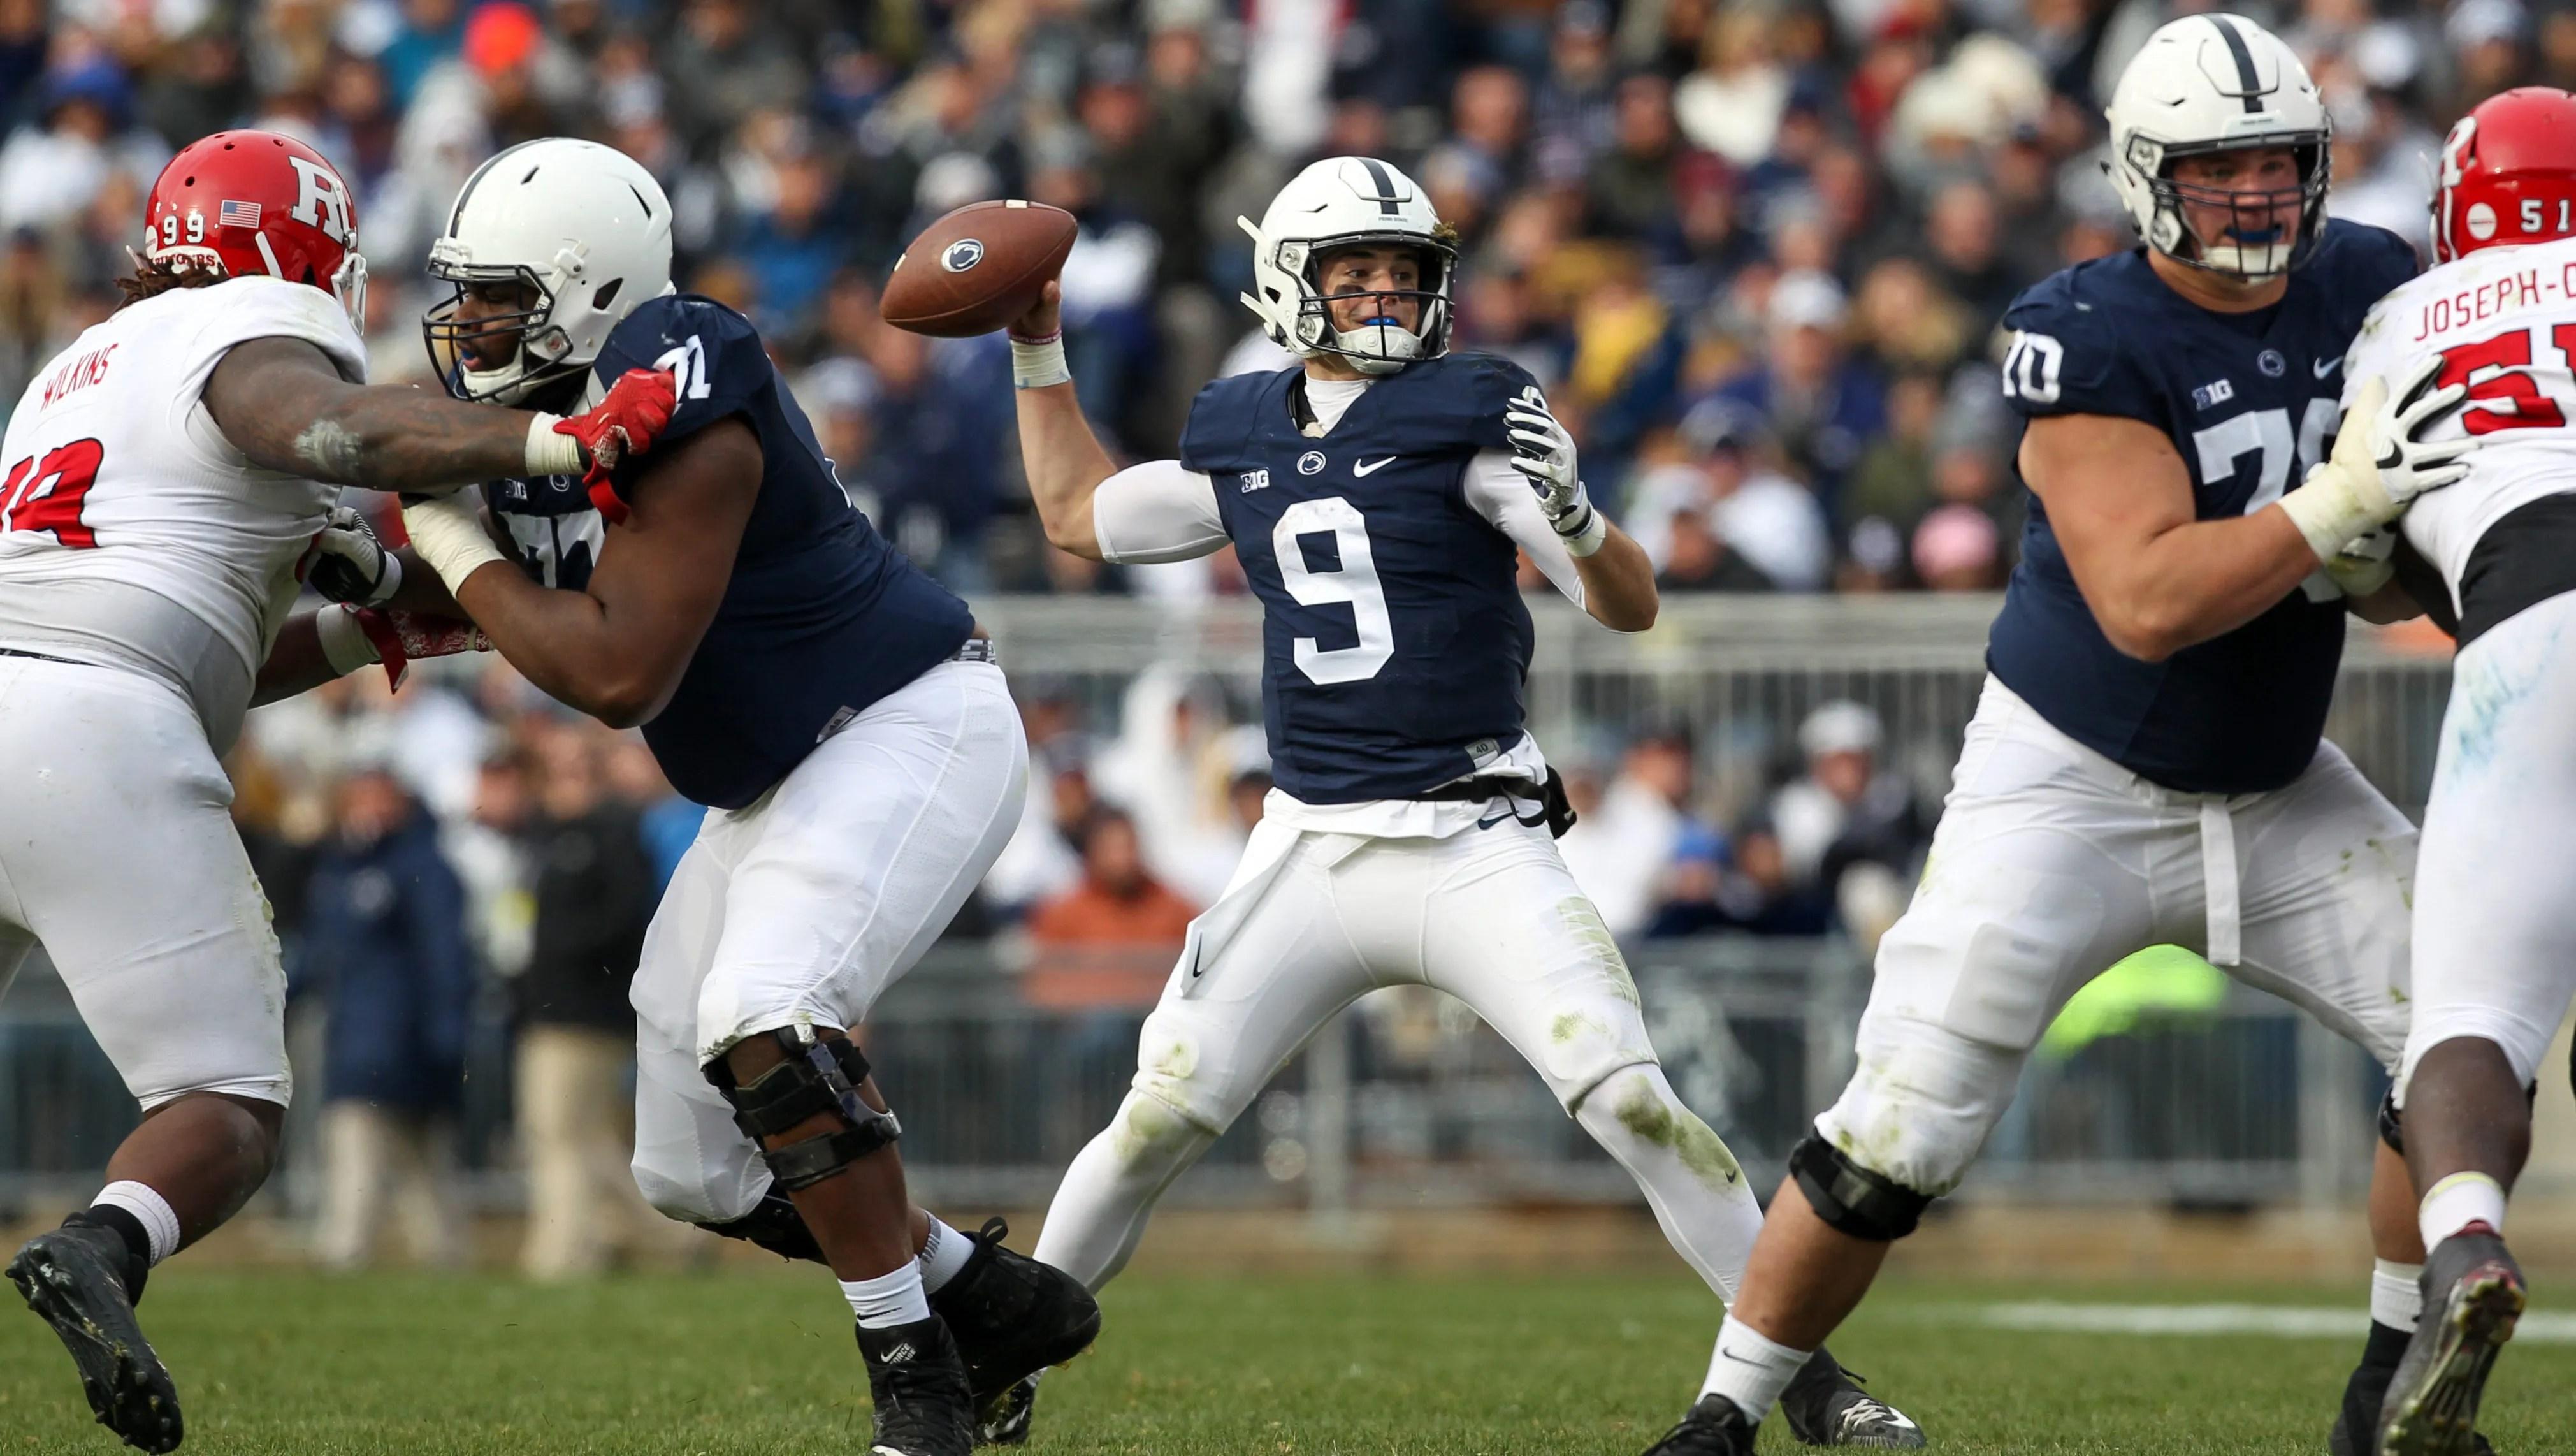 College Football S 10 Best Quarterbacks For 2018